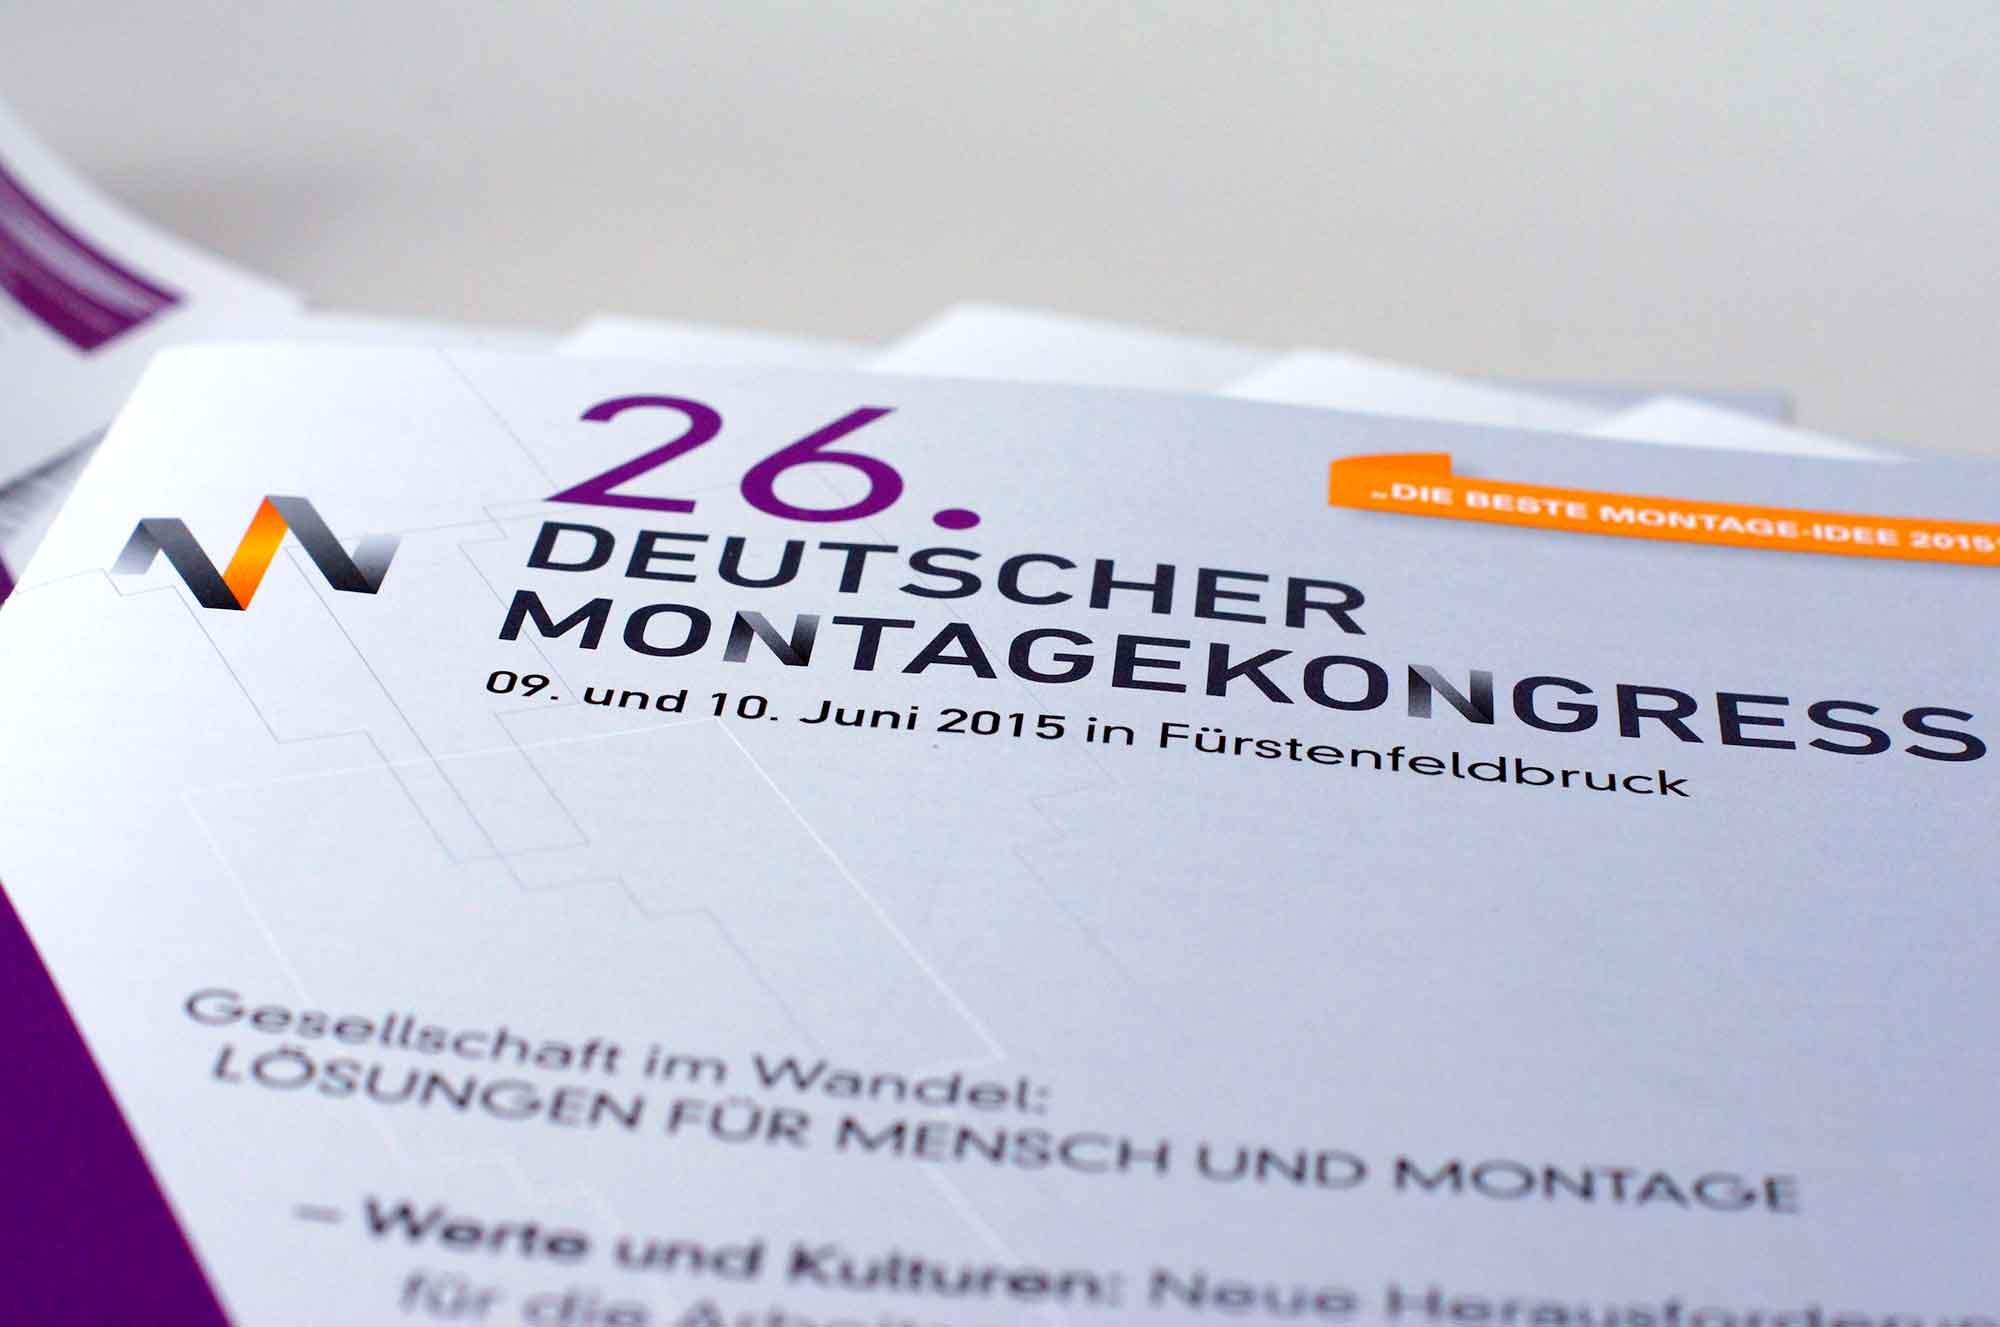 bergstromdesign.de_montage02